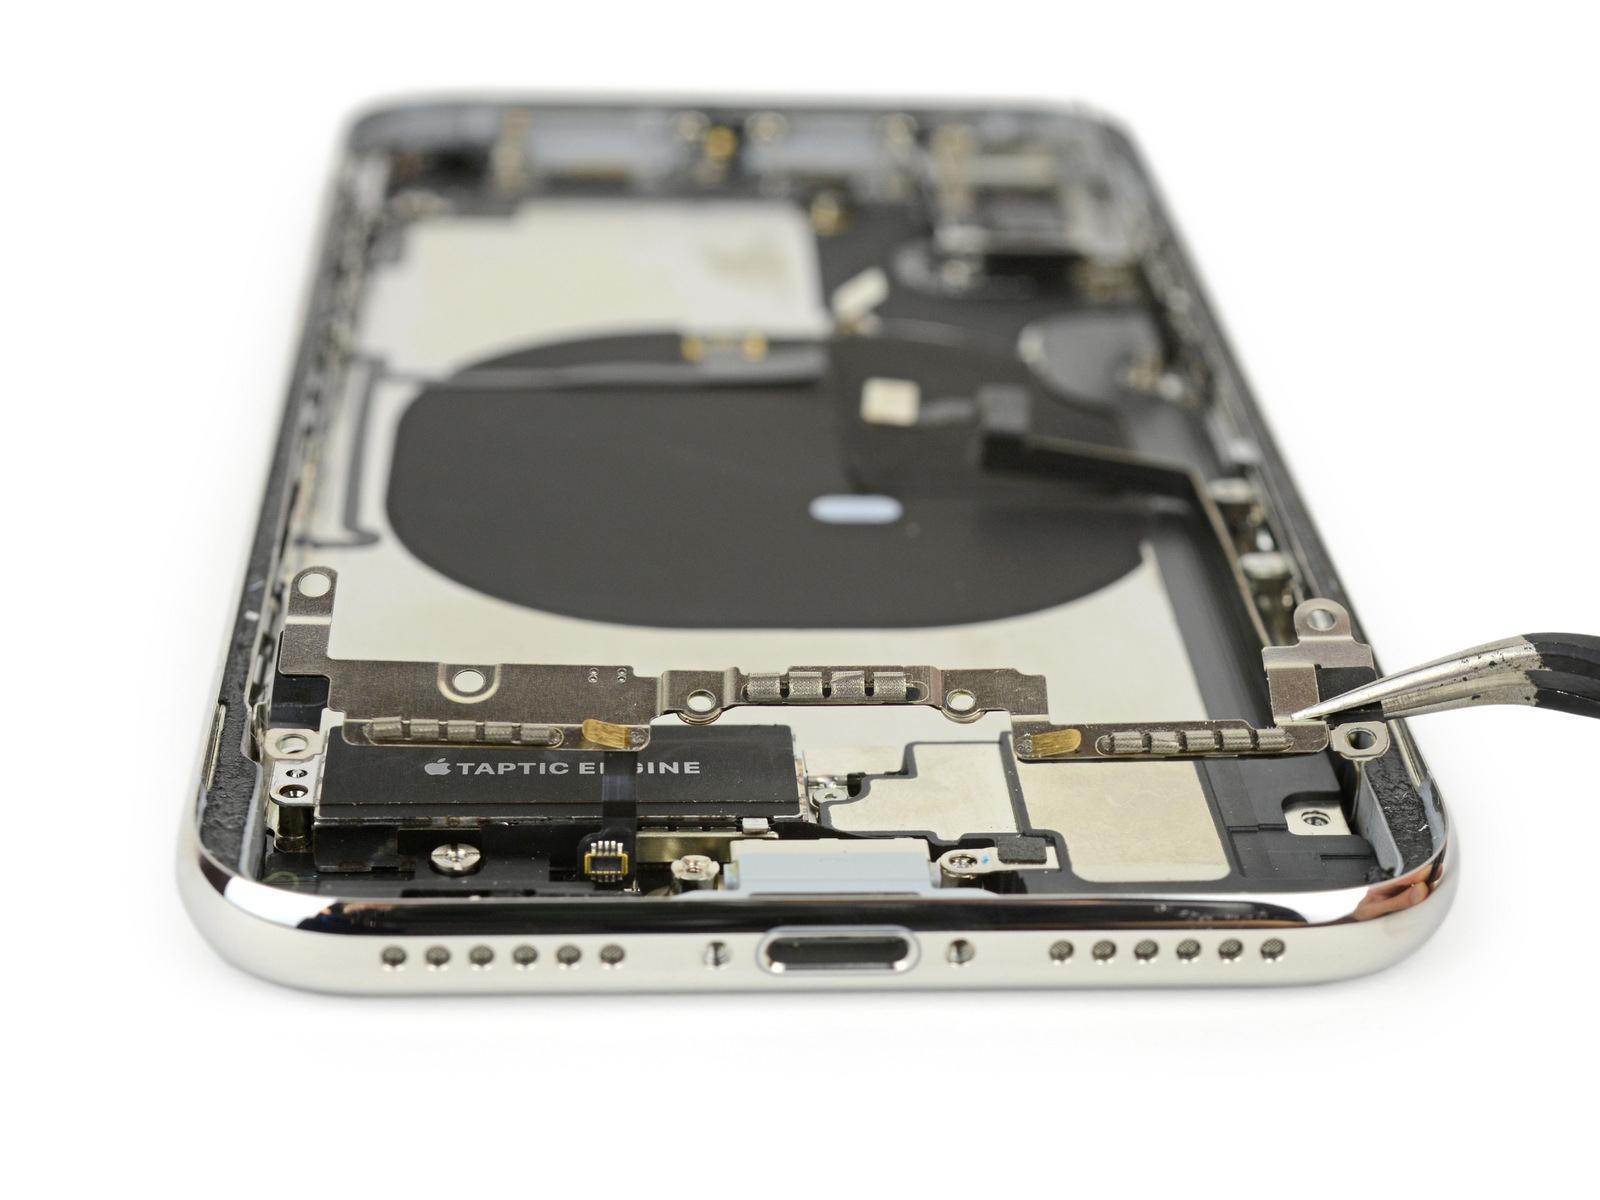 Iphone x внутри телефон samsung lafleur его функции